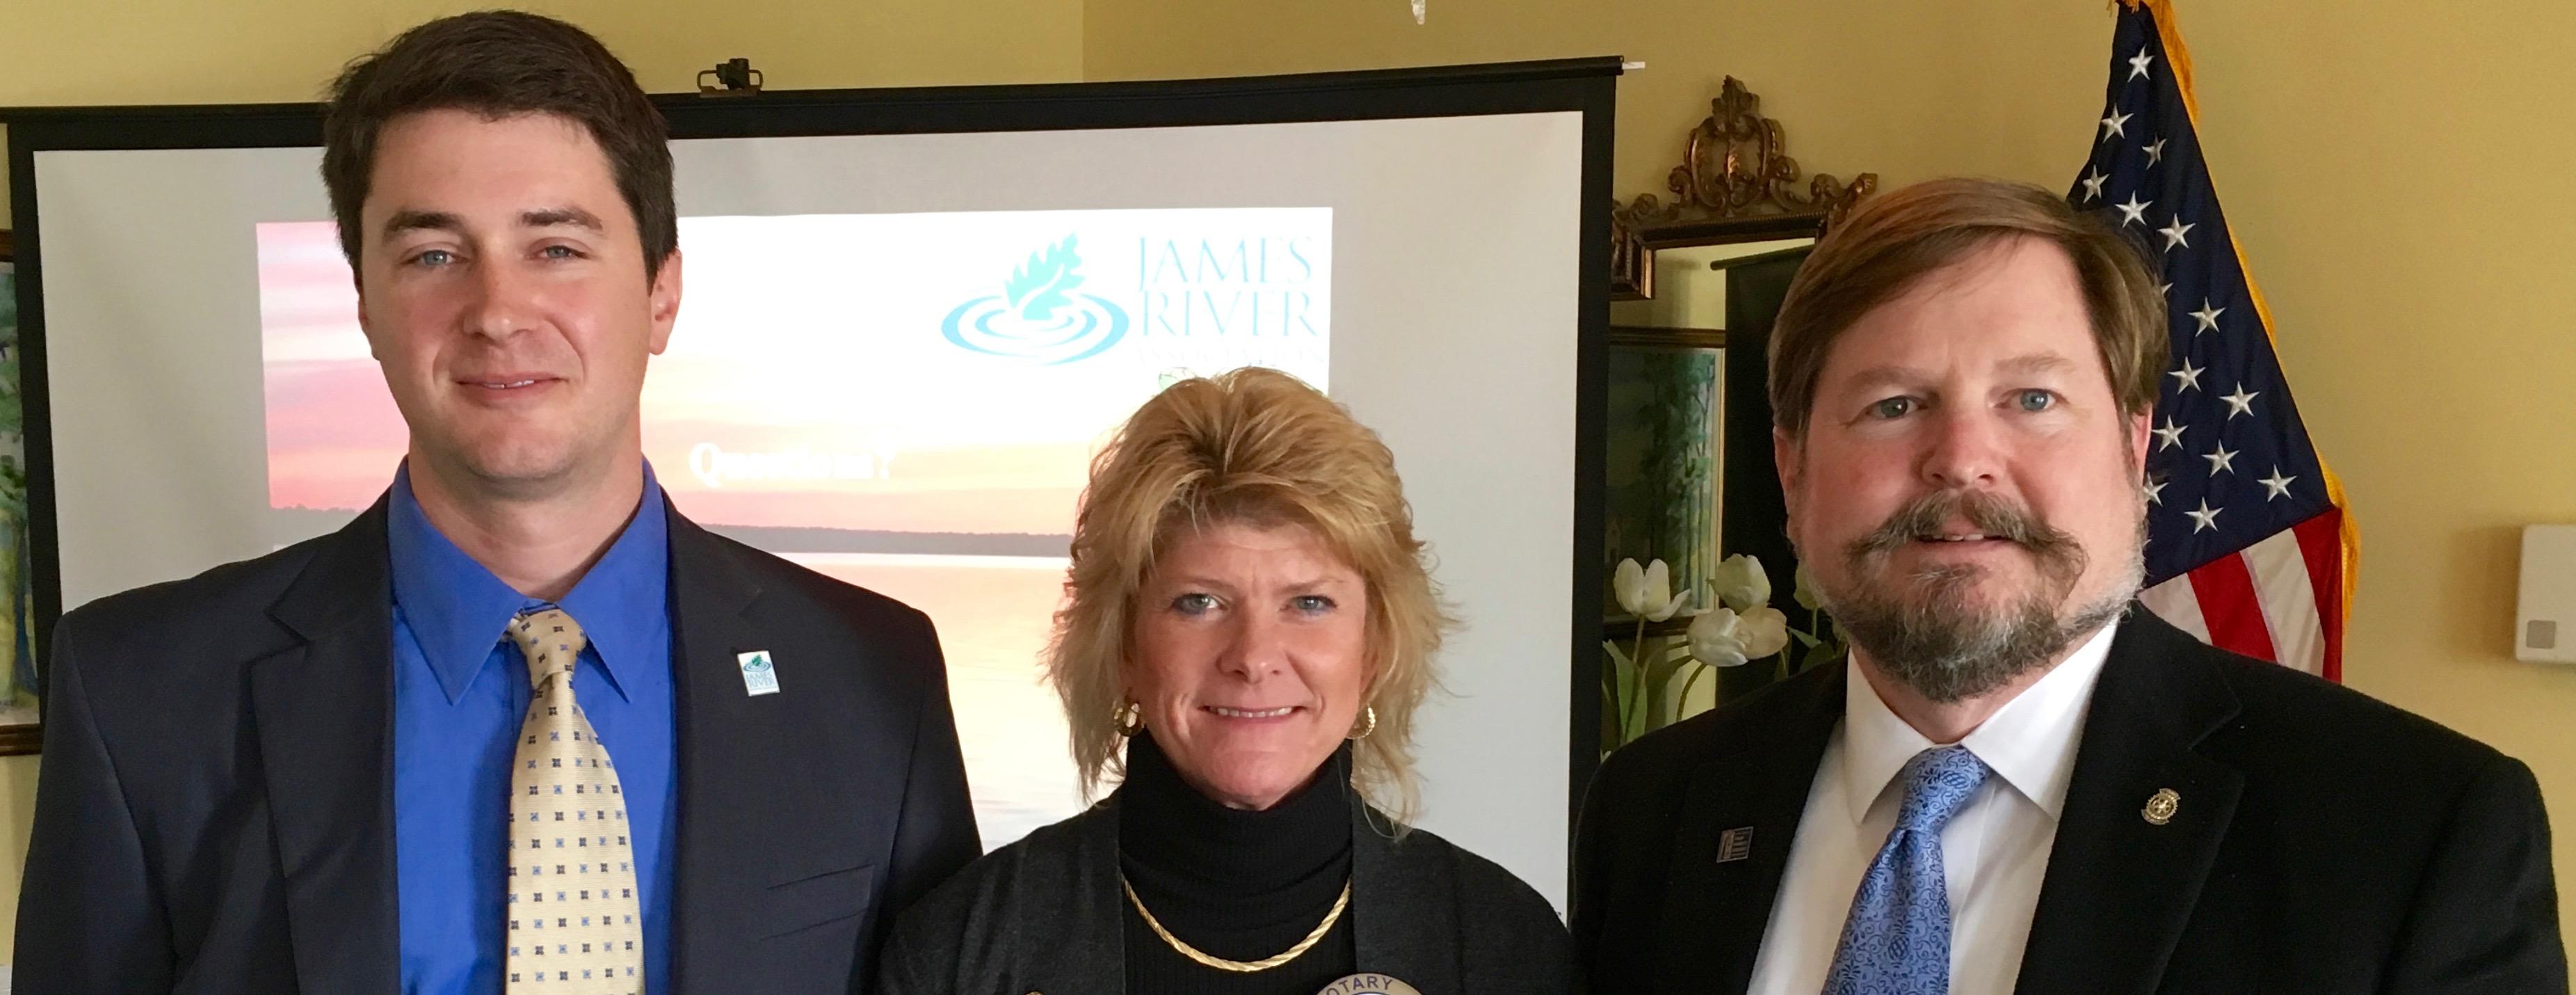 Rotary Club of Newport News Hosts James River Association